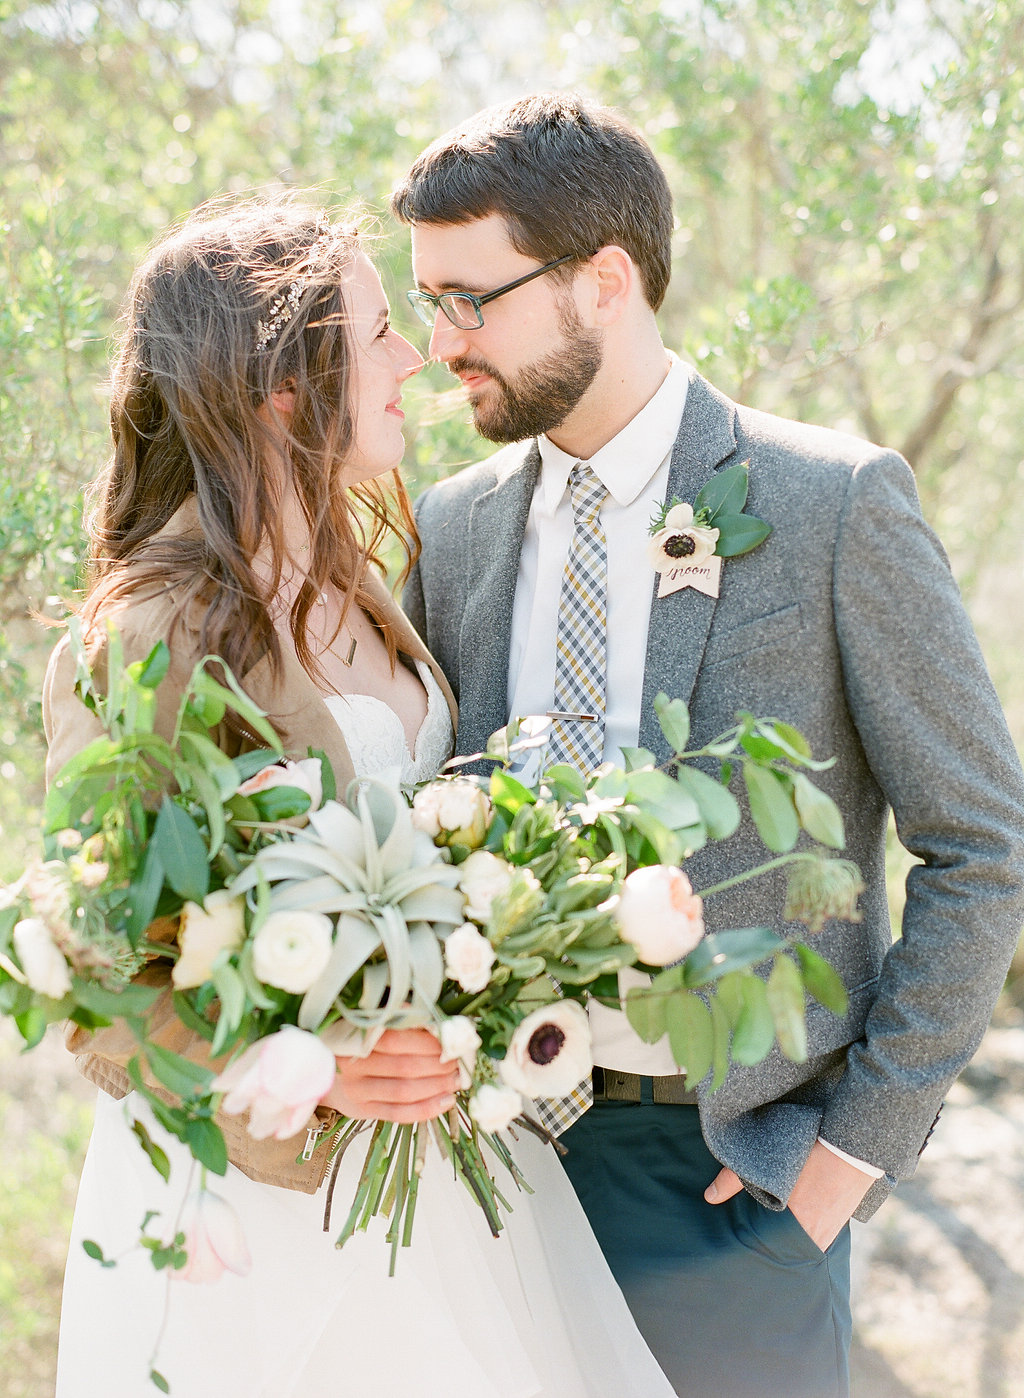 sarah-seven-worthington-ivory-and-beau-savannah-wedding-planner-savannah-bridal-boutique-savannah-wedding-dresses-organza-flowy-wedding-dress-savannah-wedding-florist-bouquet.jpg